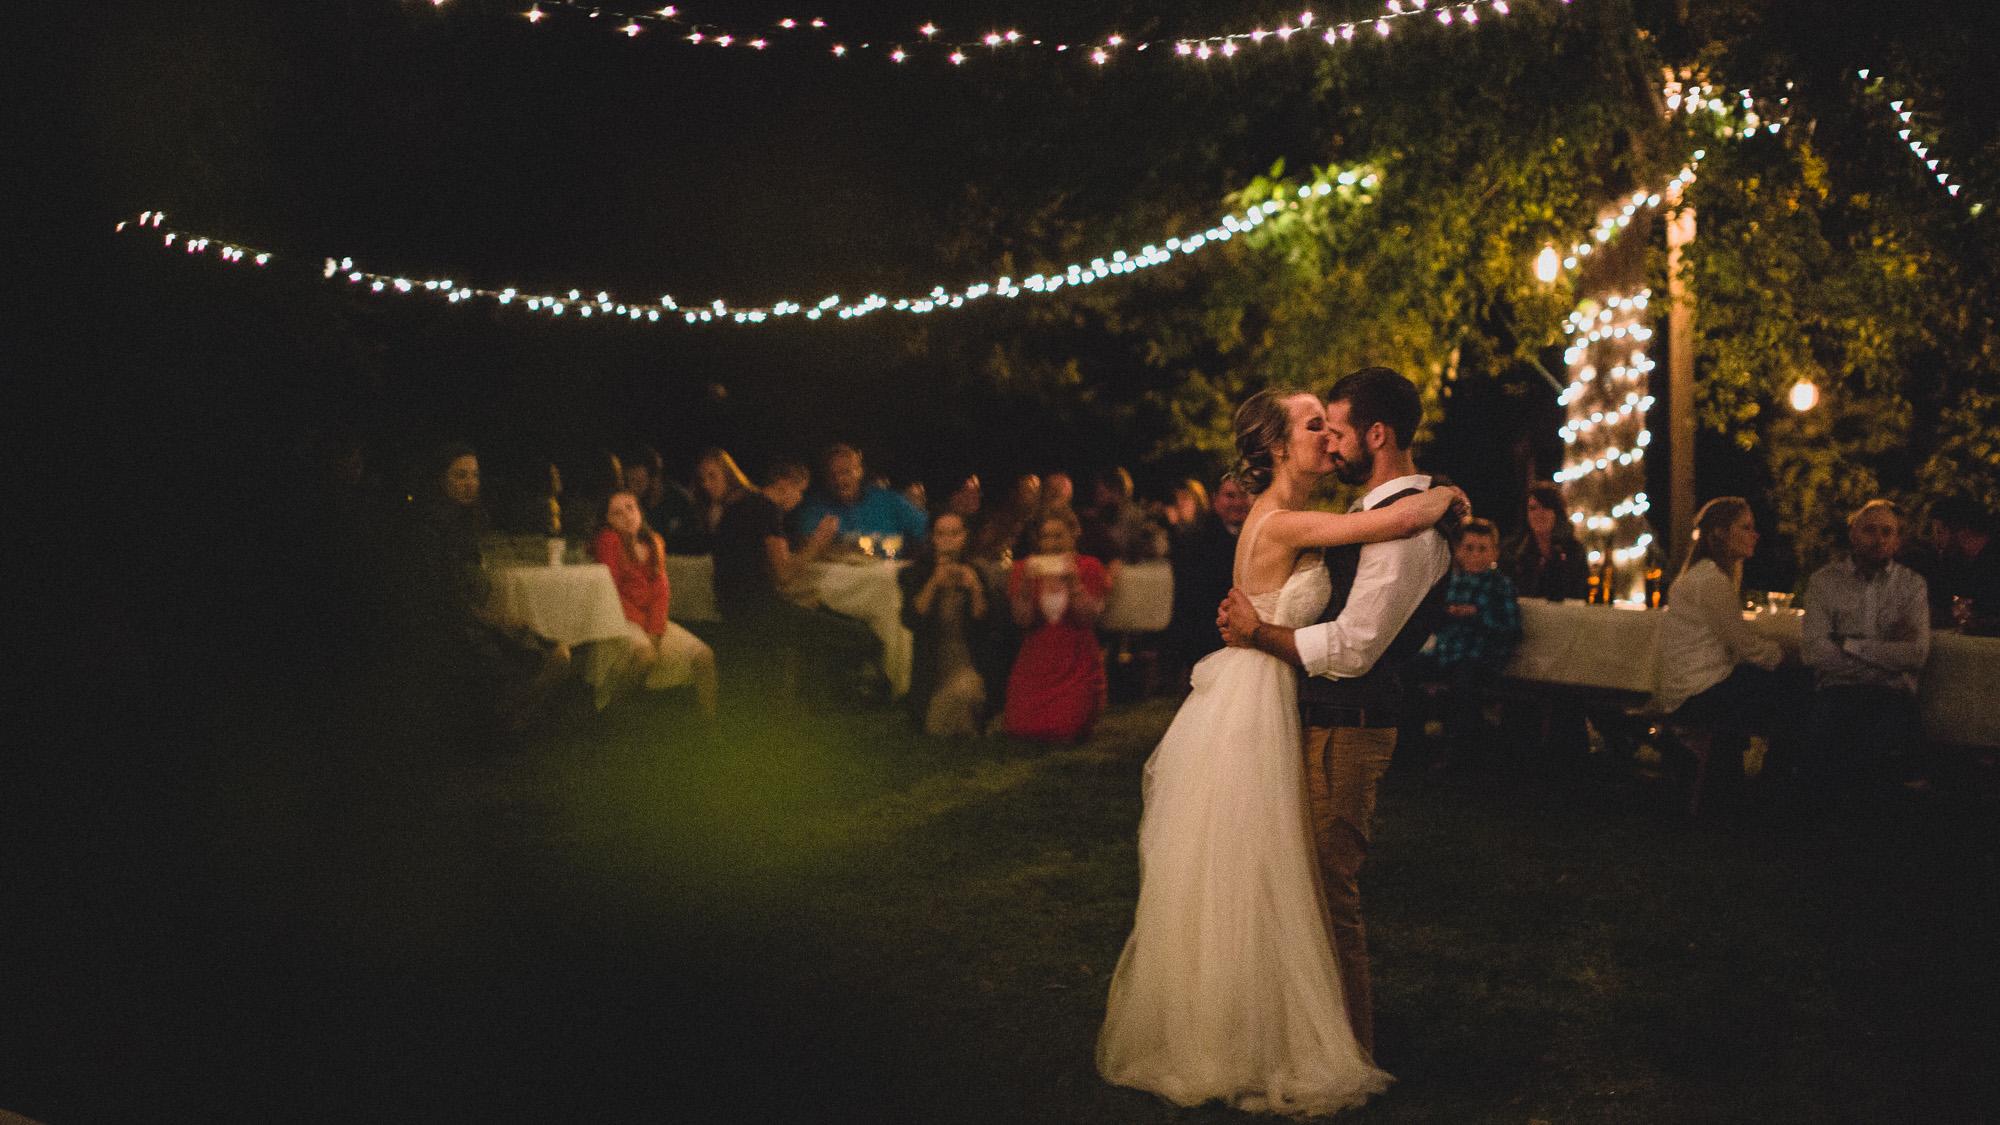 alec_vanderboom_springfield_missouri_wedding-0086.jpg